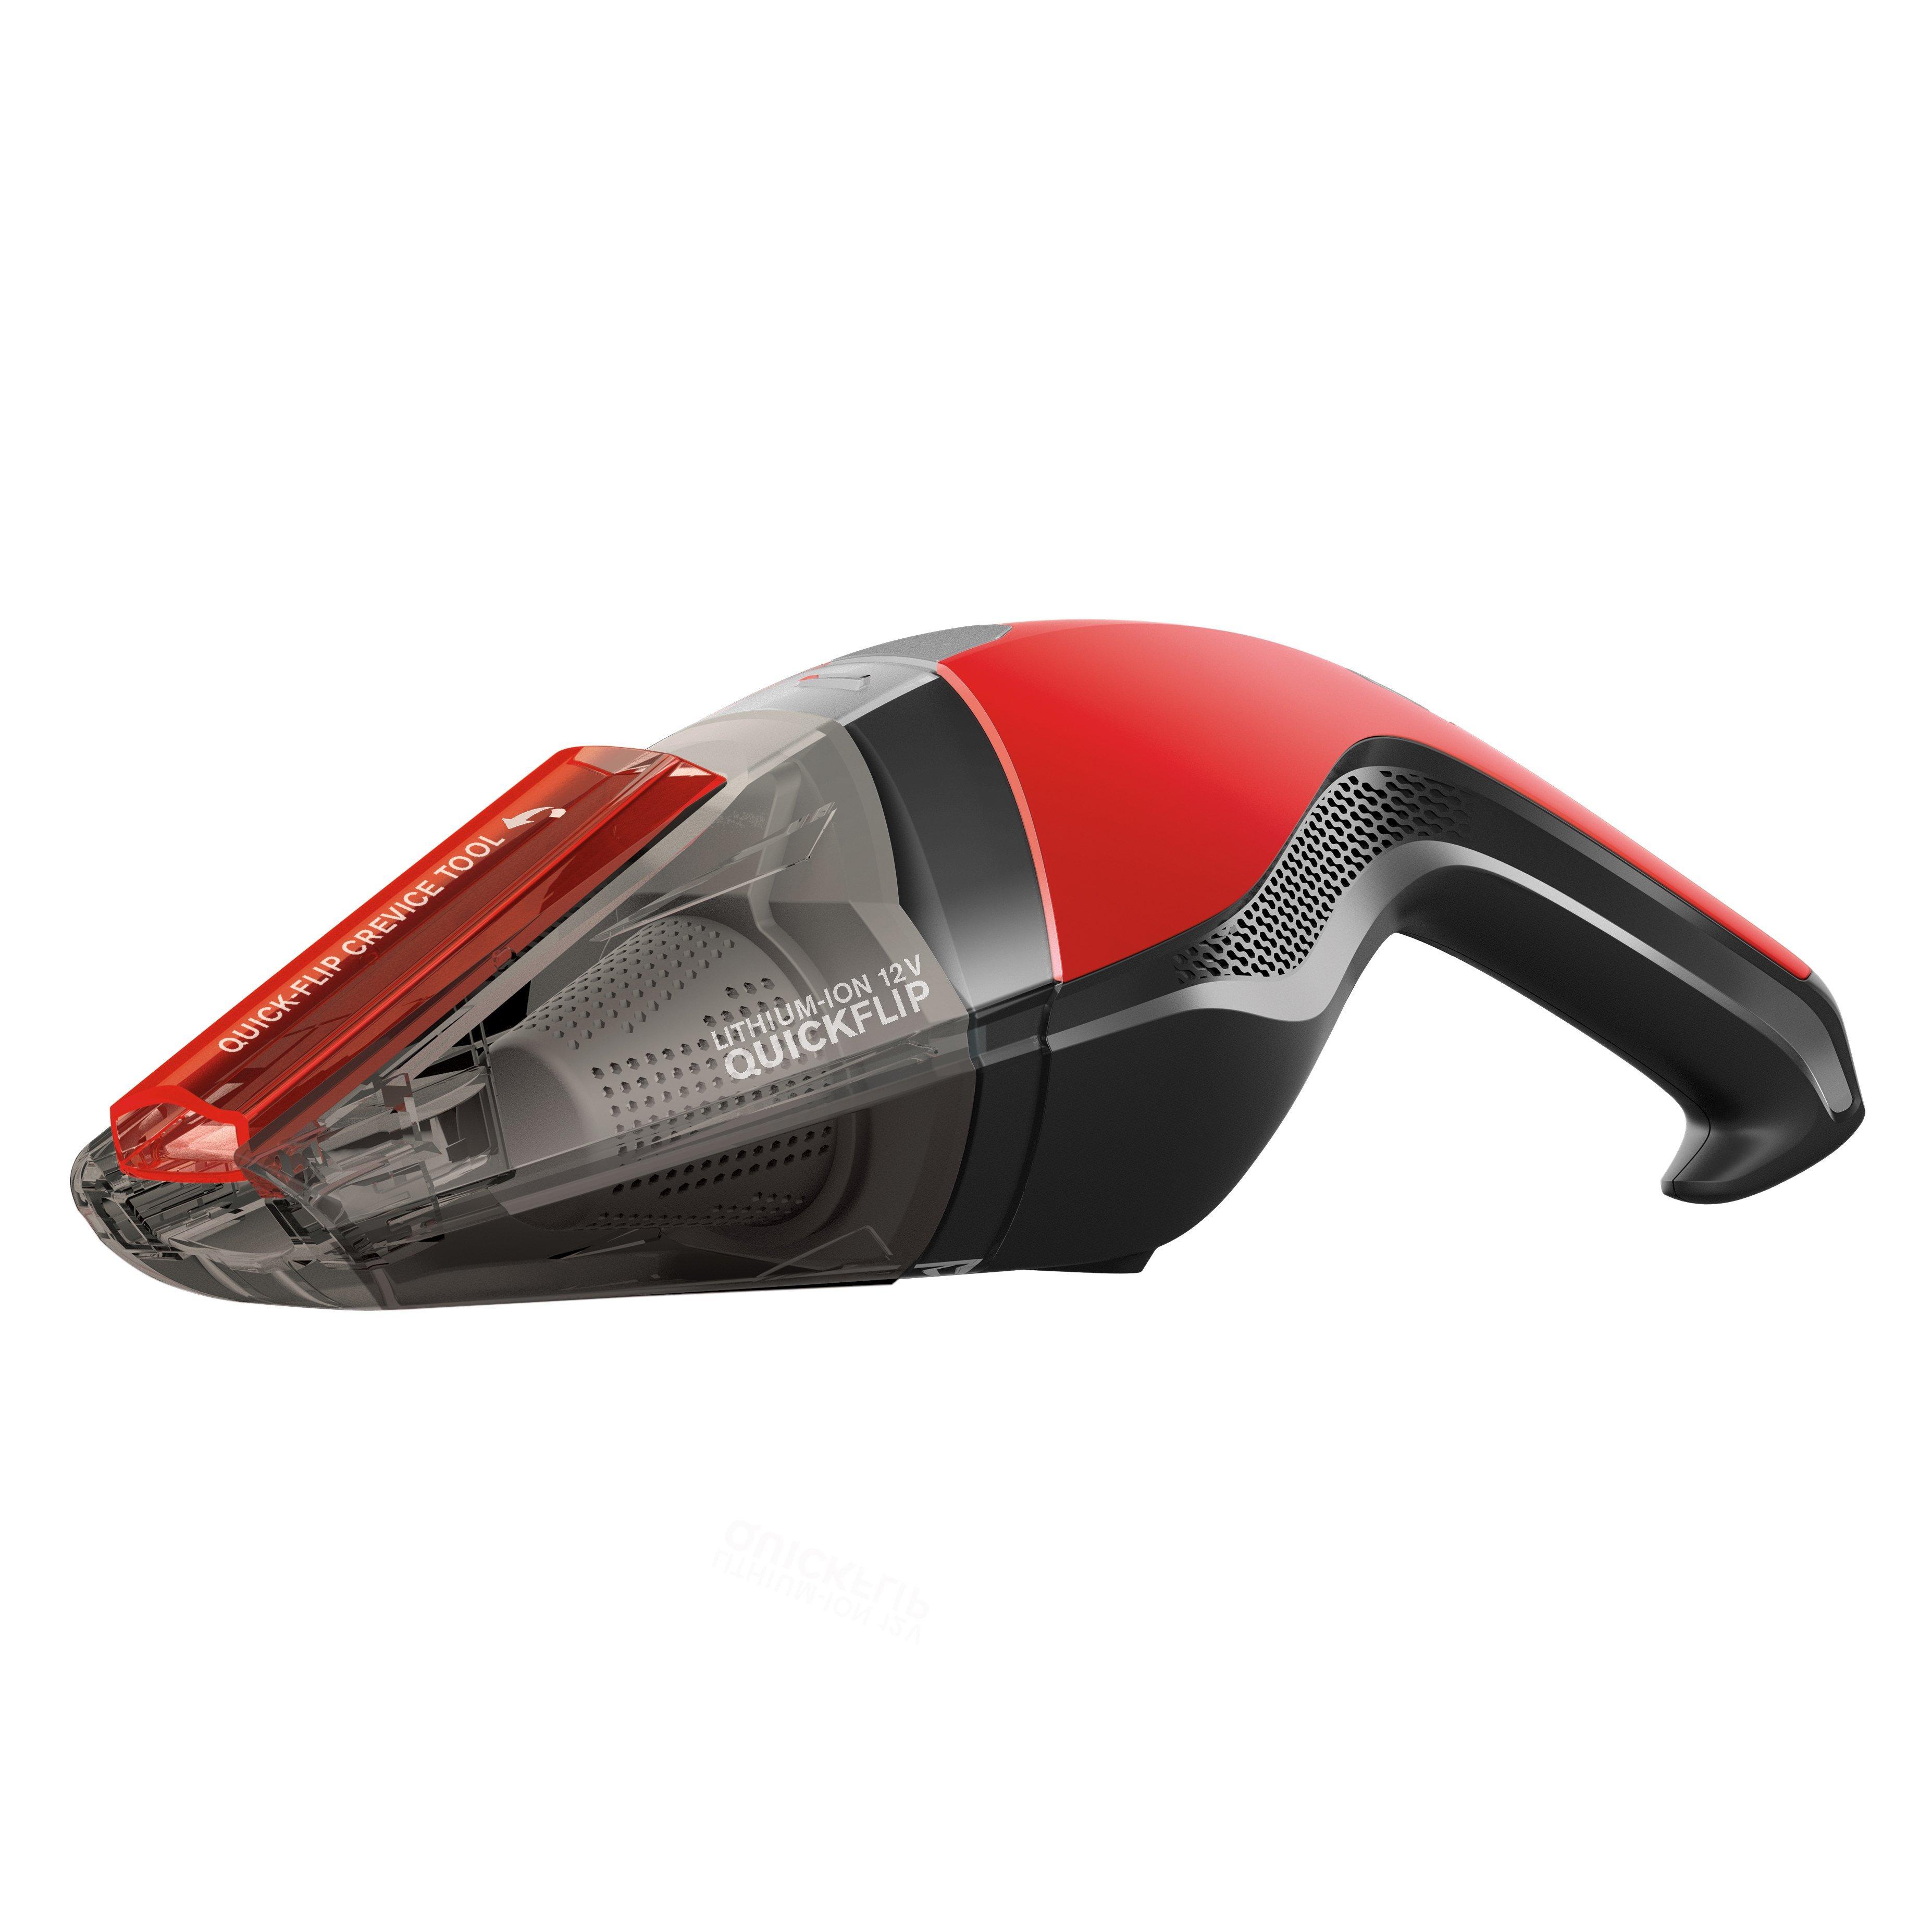 Quick Flip 12V Cordless Hand Vacuum1